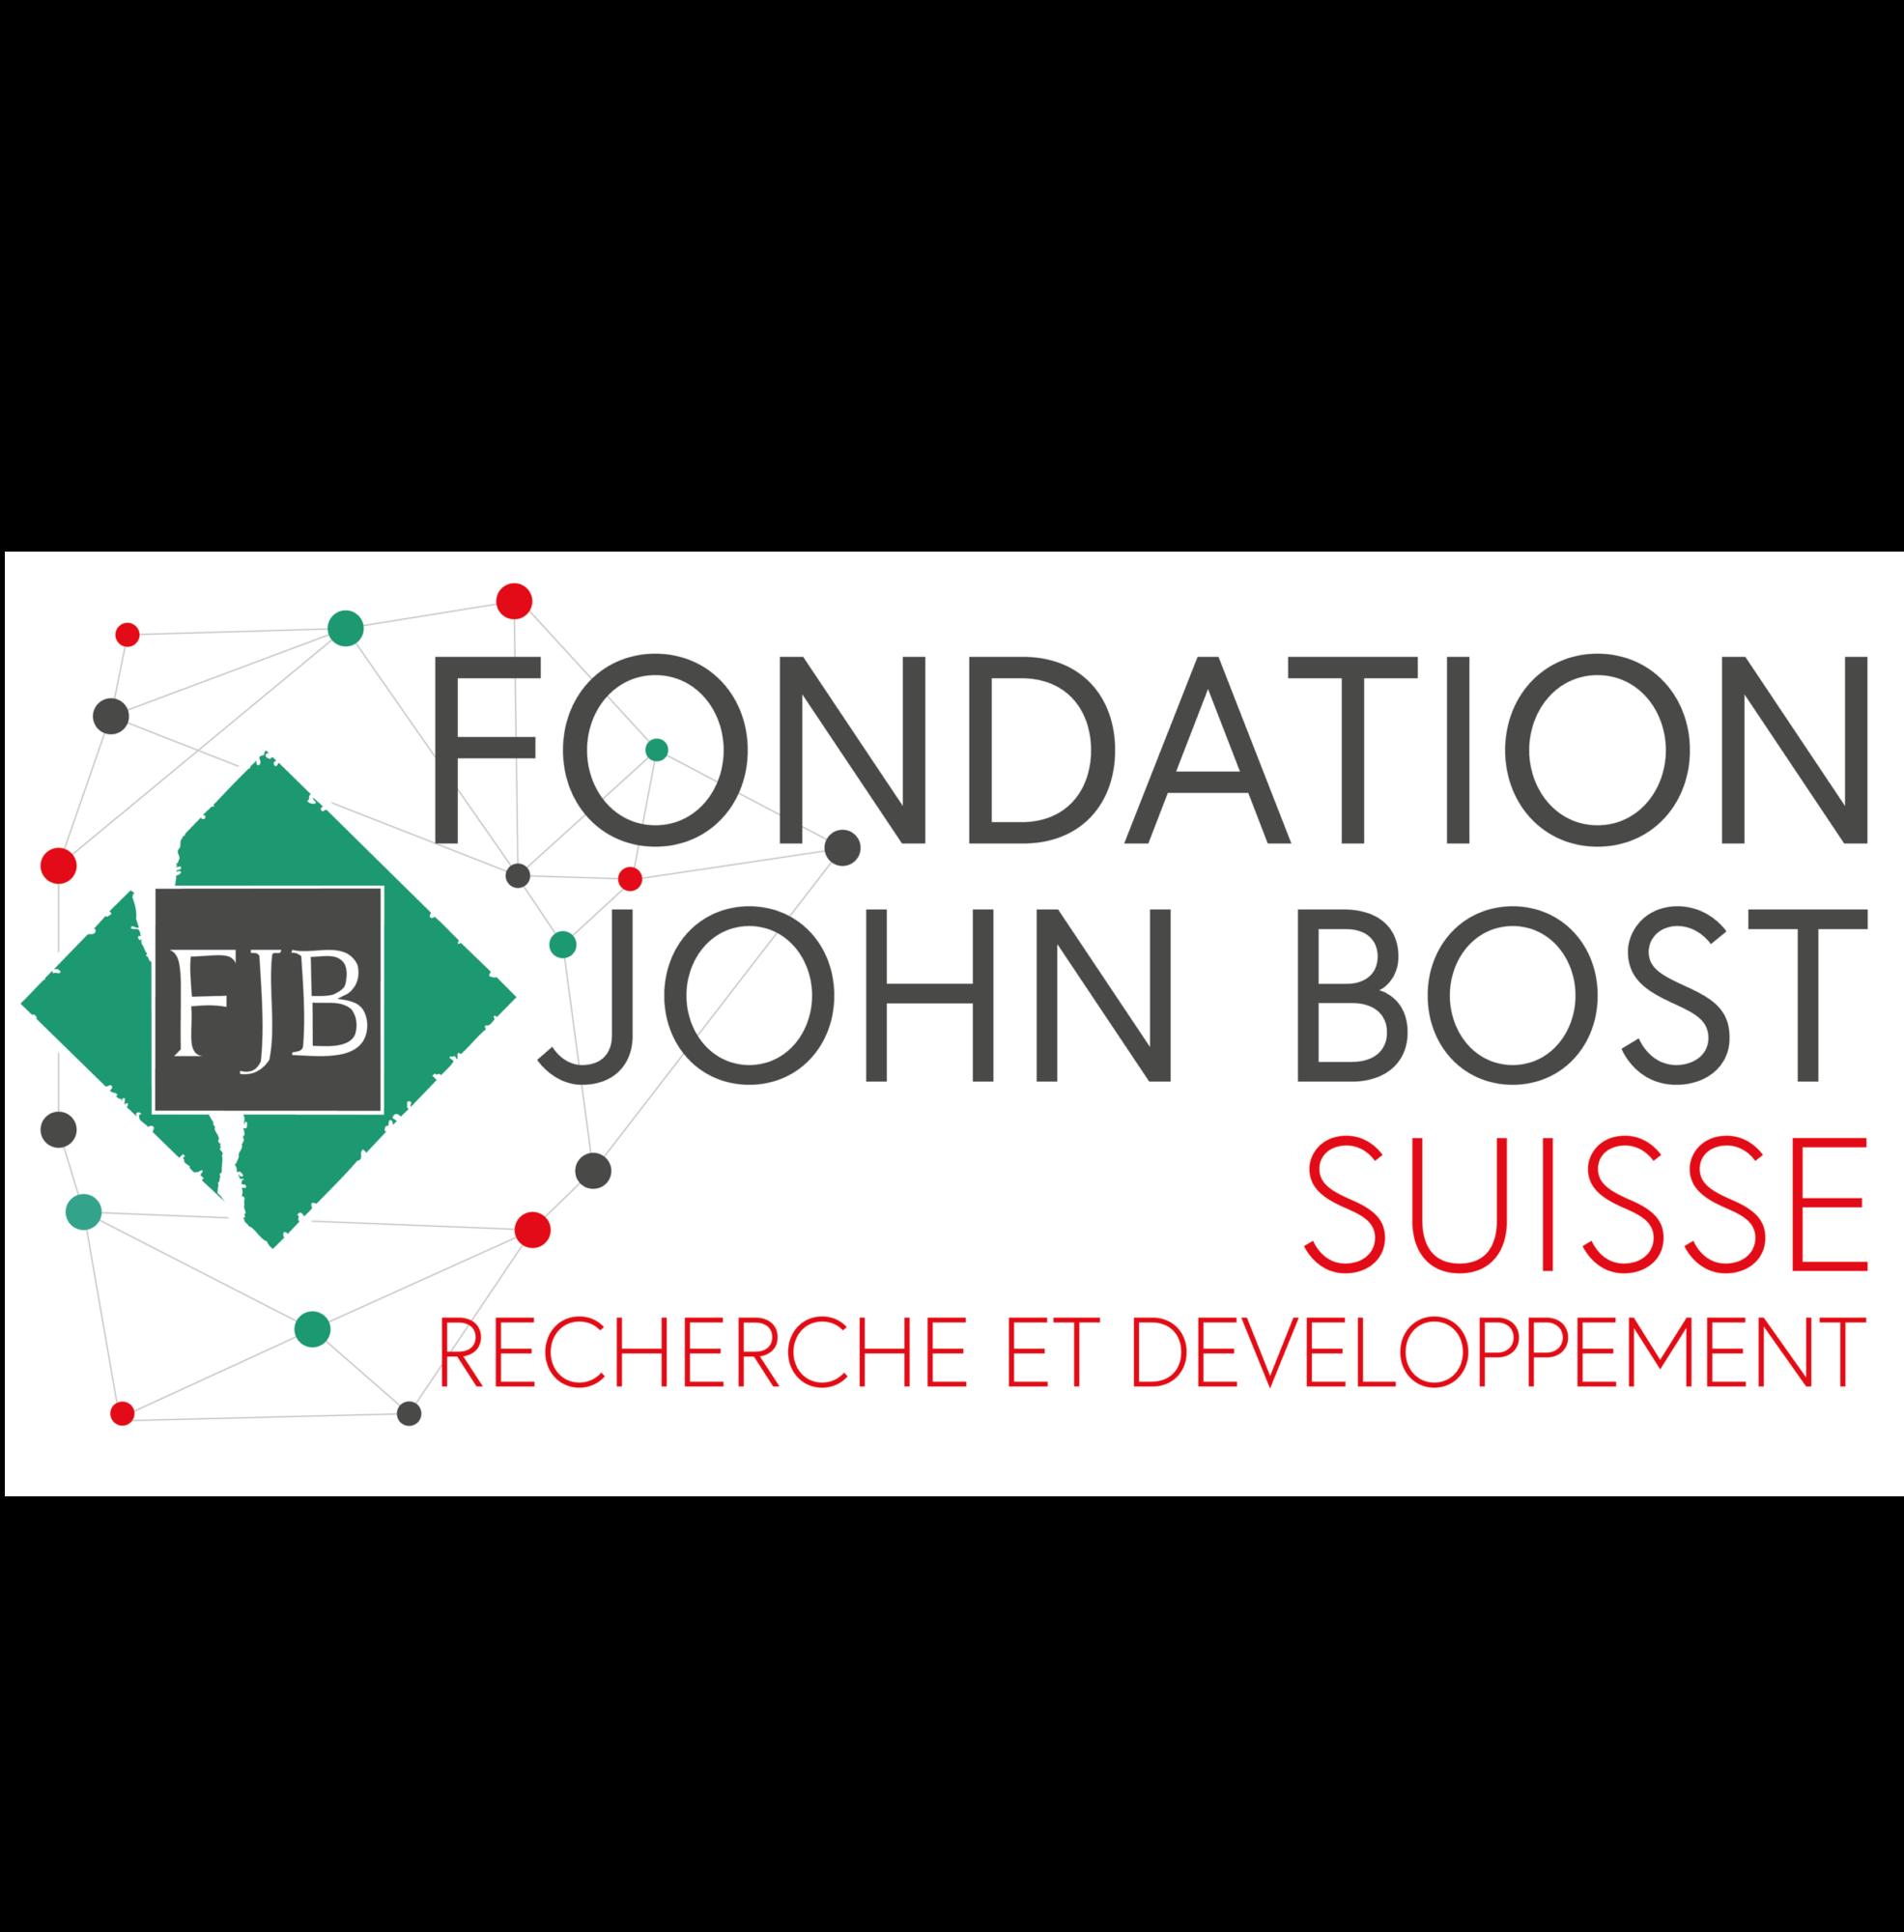 Logo Fondation John Bost Suisse